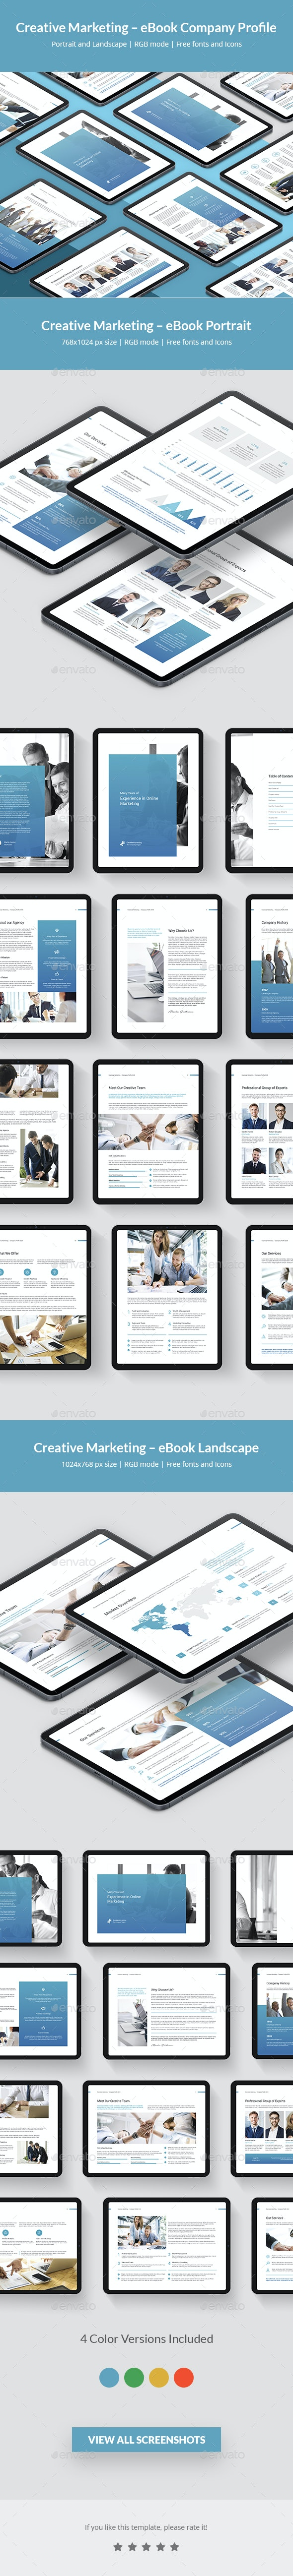 Creative Marketing – eBook Company Profile - Digital Books ePublishing